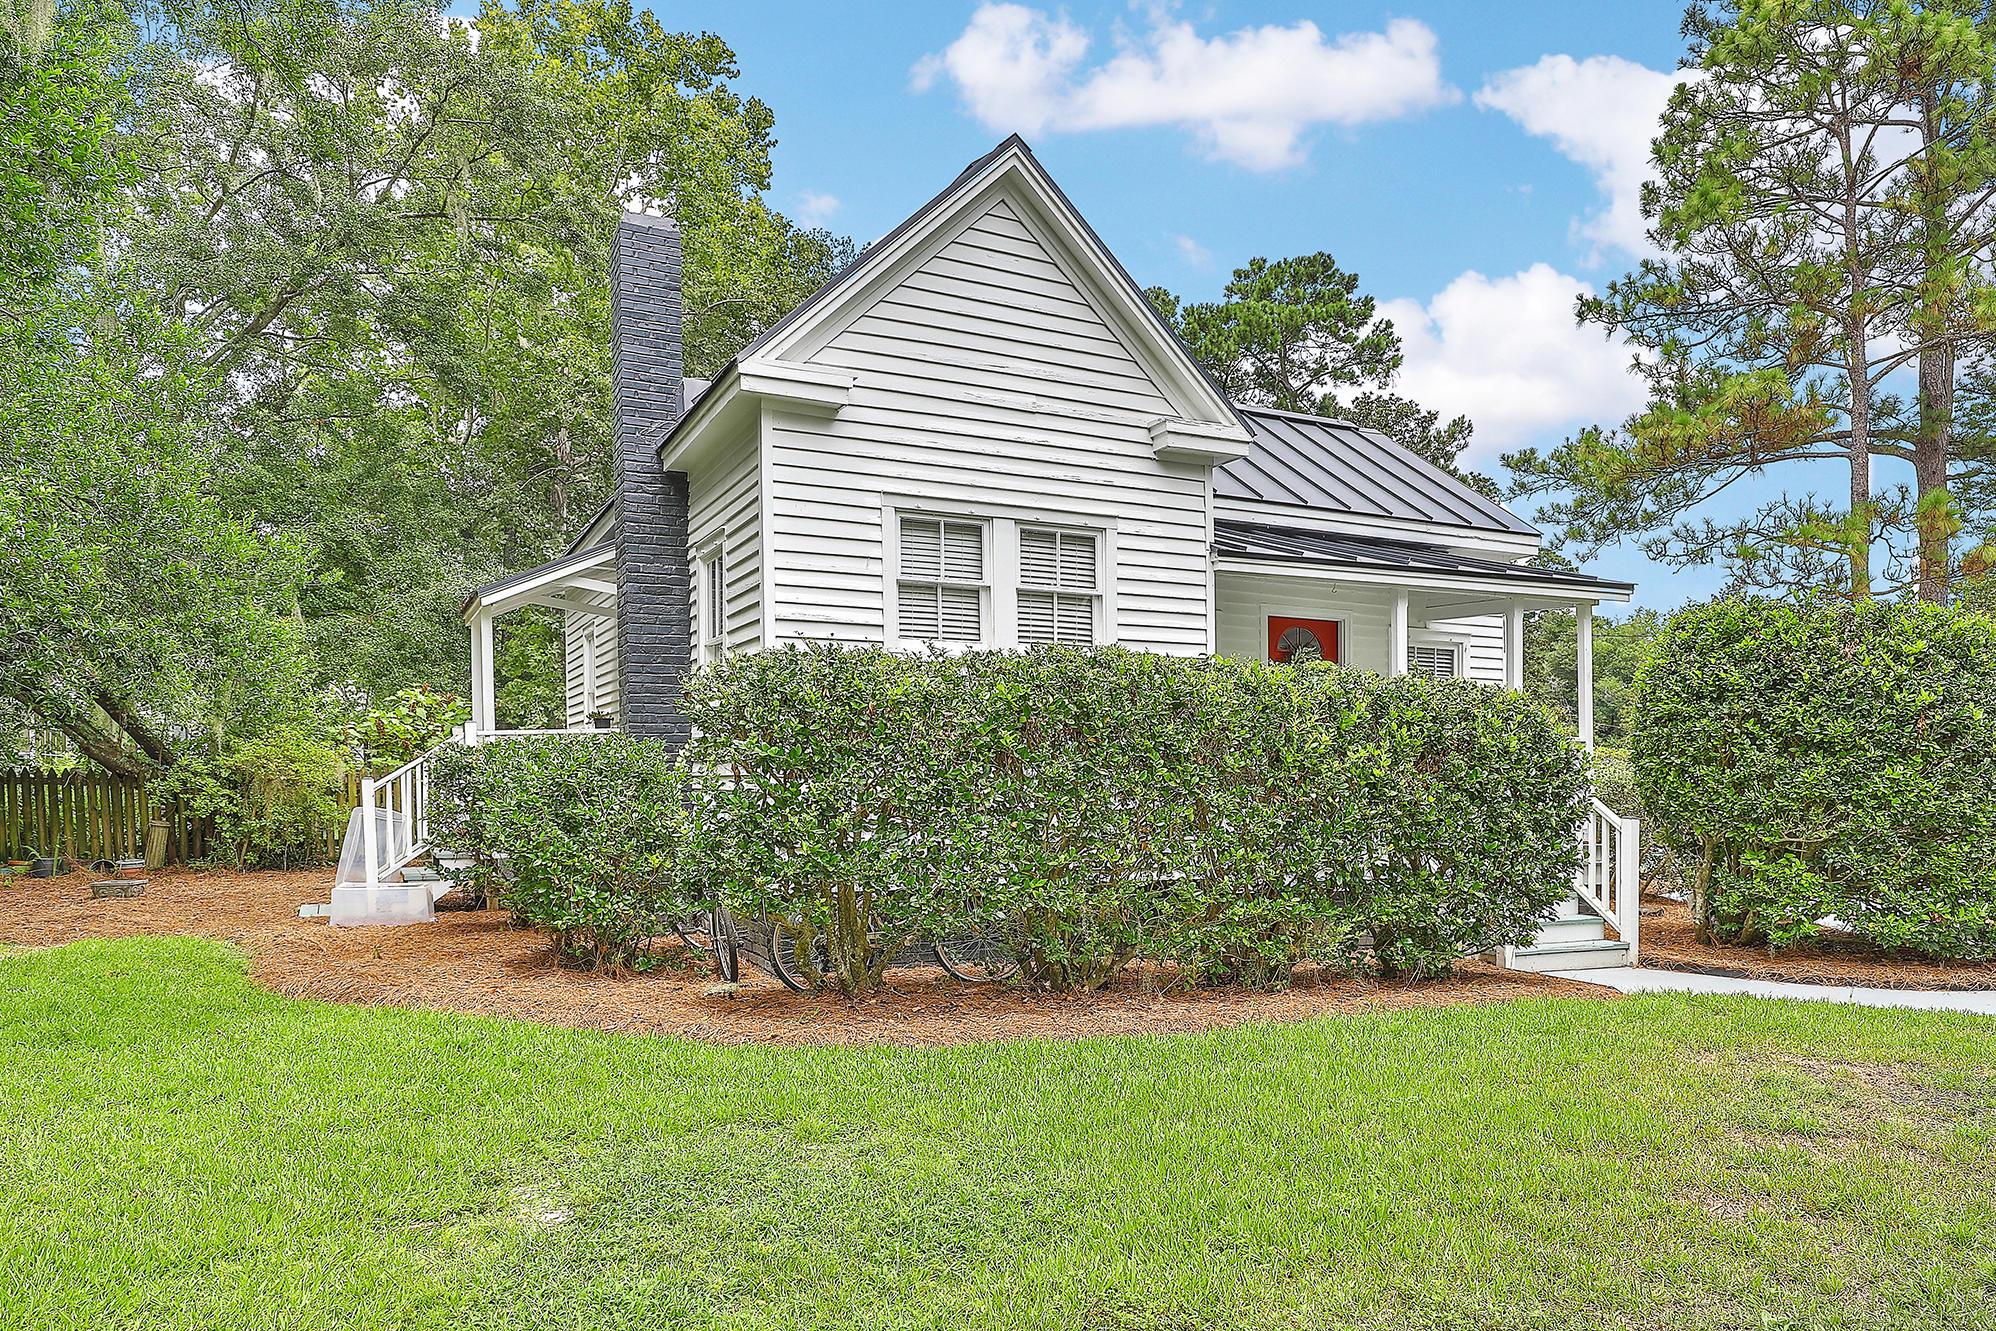 Summerville Homes For Sale - 102 Hickory, Summerville, SC - 11